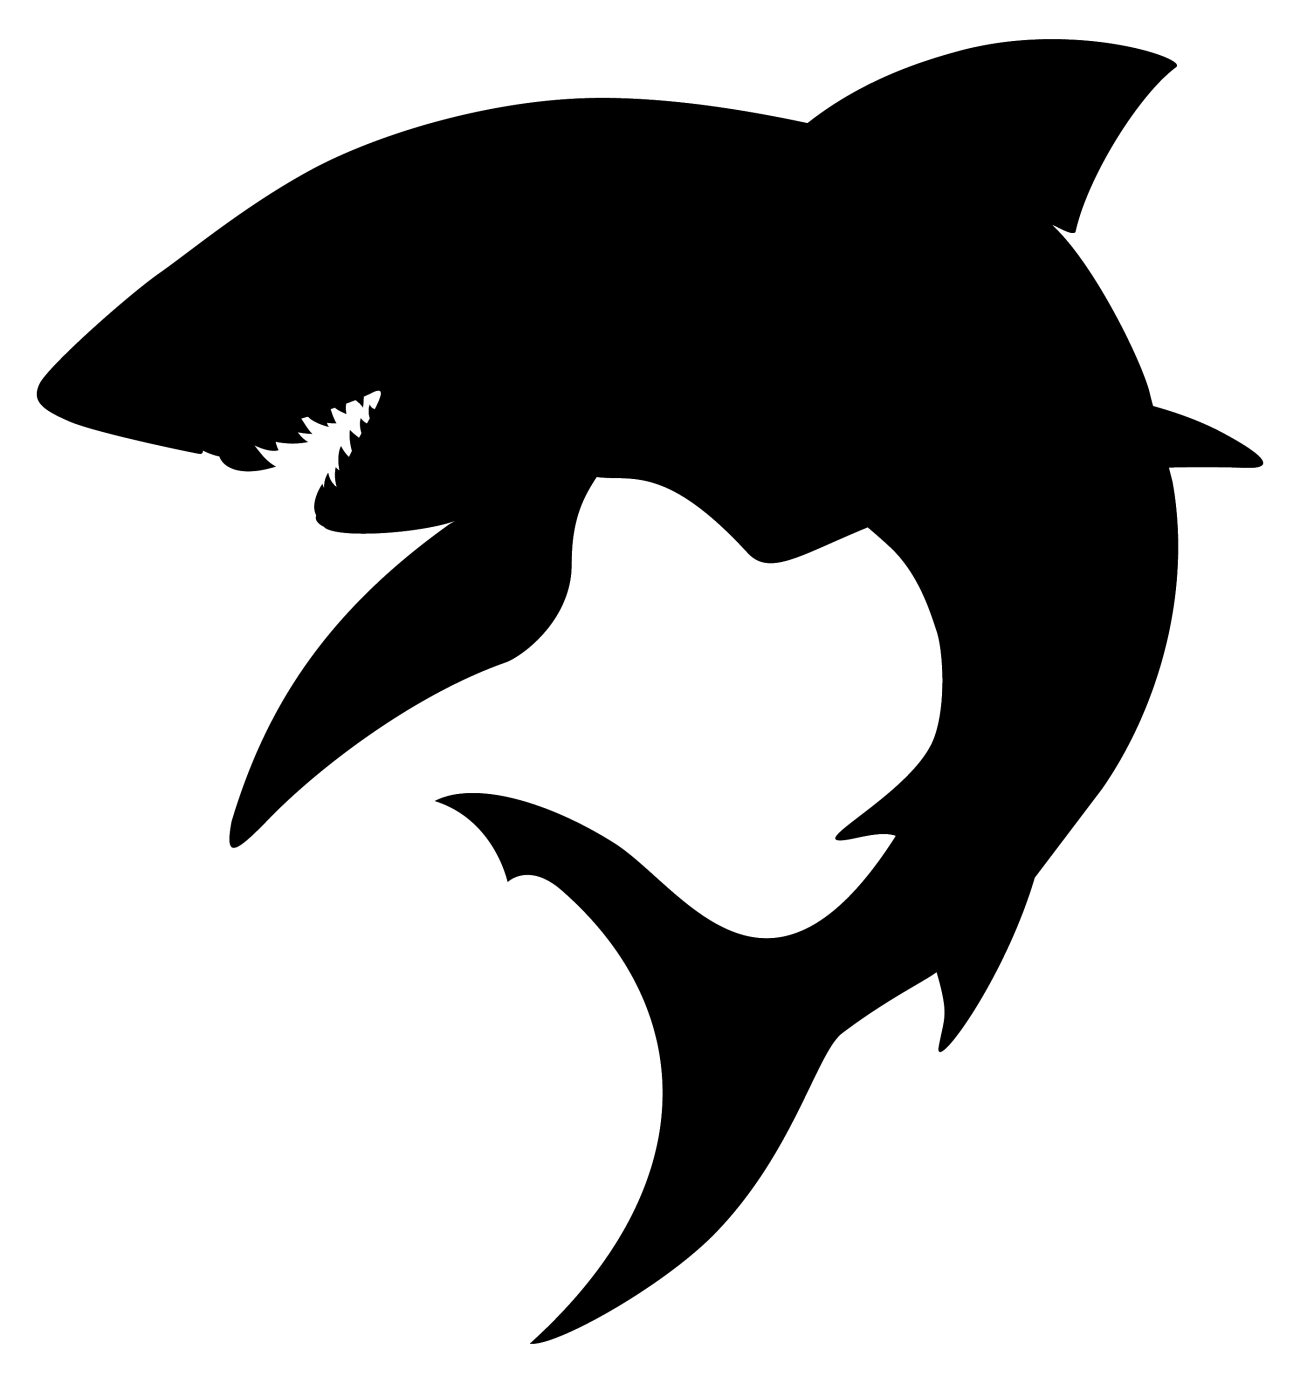 Clipart shark silhouette. Clip art sharks transprent